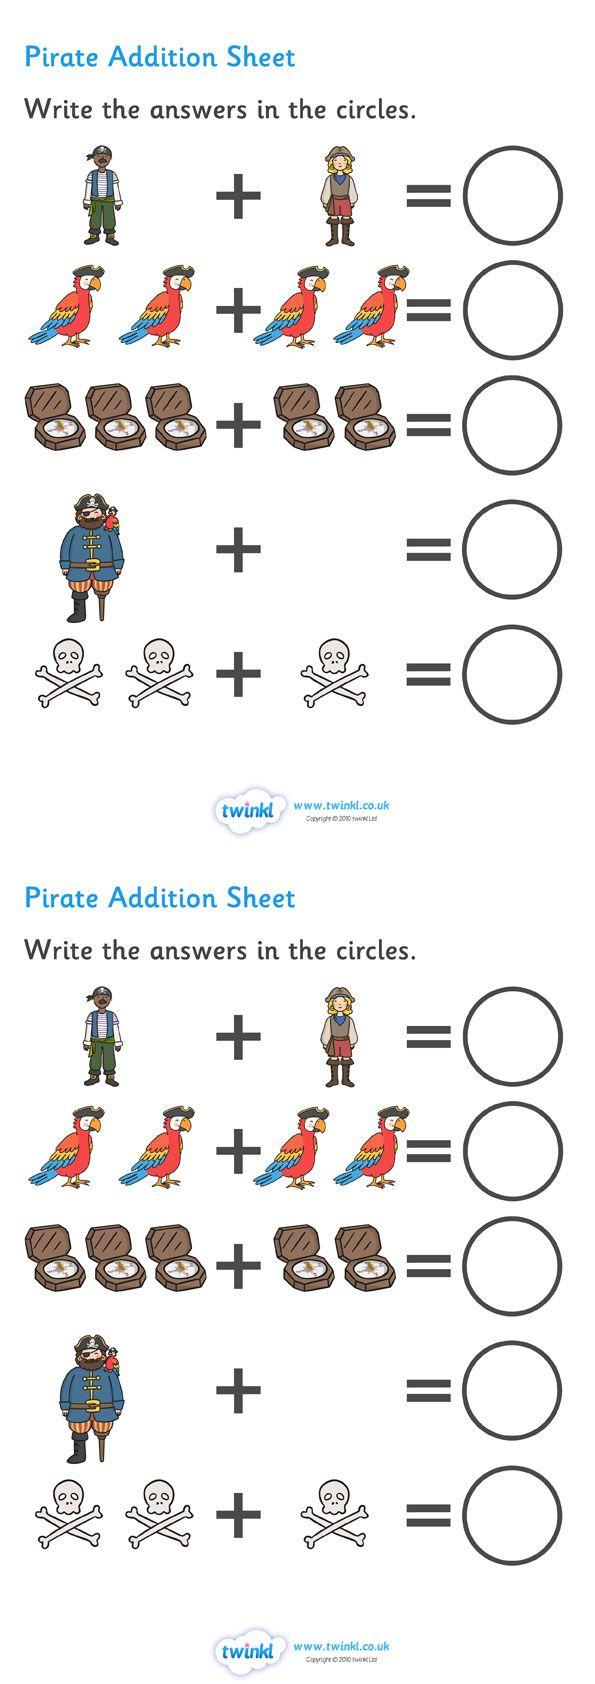 Pirate Addition Sheet Pirates Preschool Pirate Theme Pirate Activities [ 1684 x 595 Pixel ]